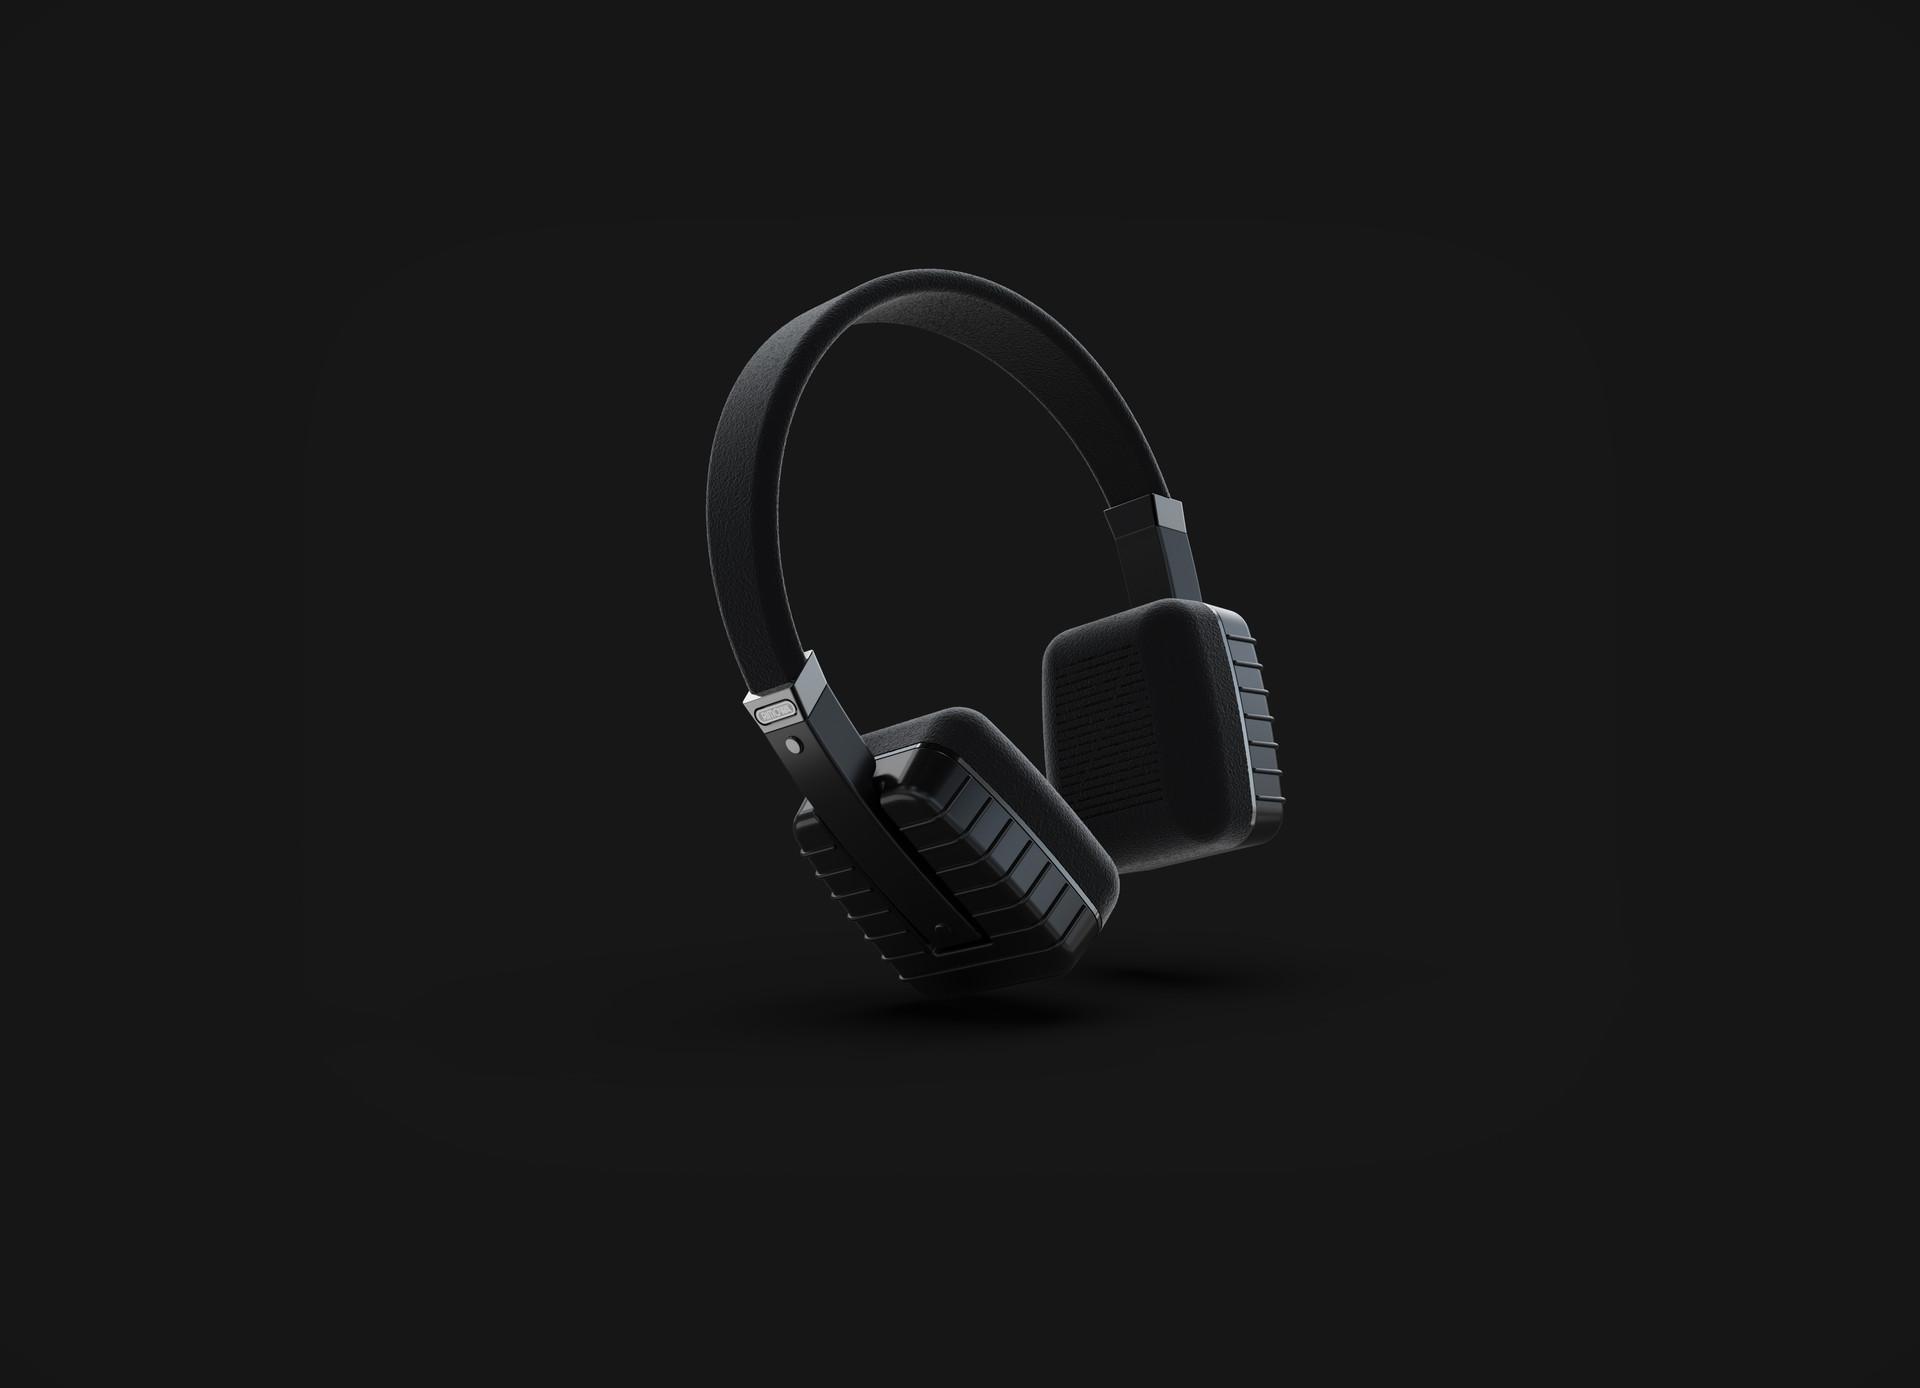 Essential Add-On, RIMOWA inspired headphones